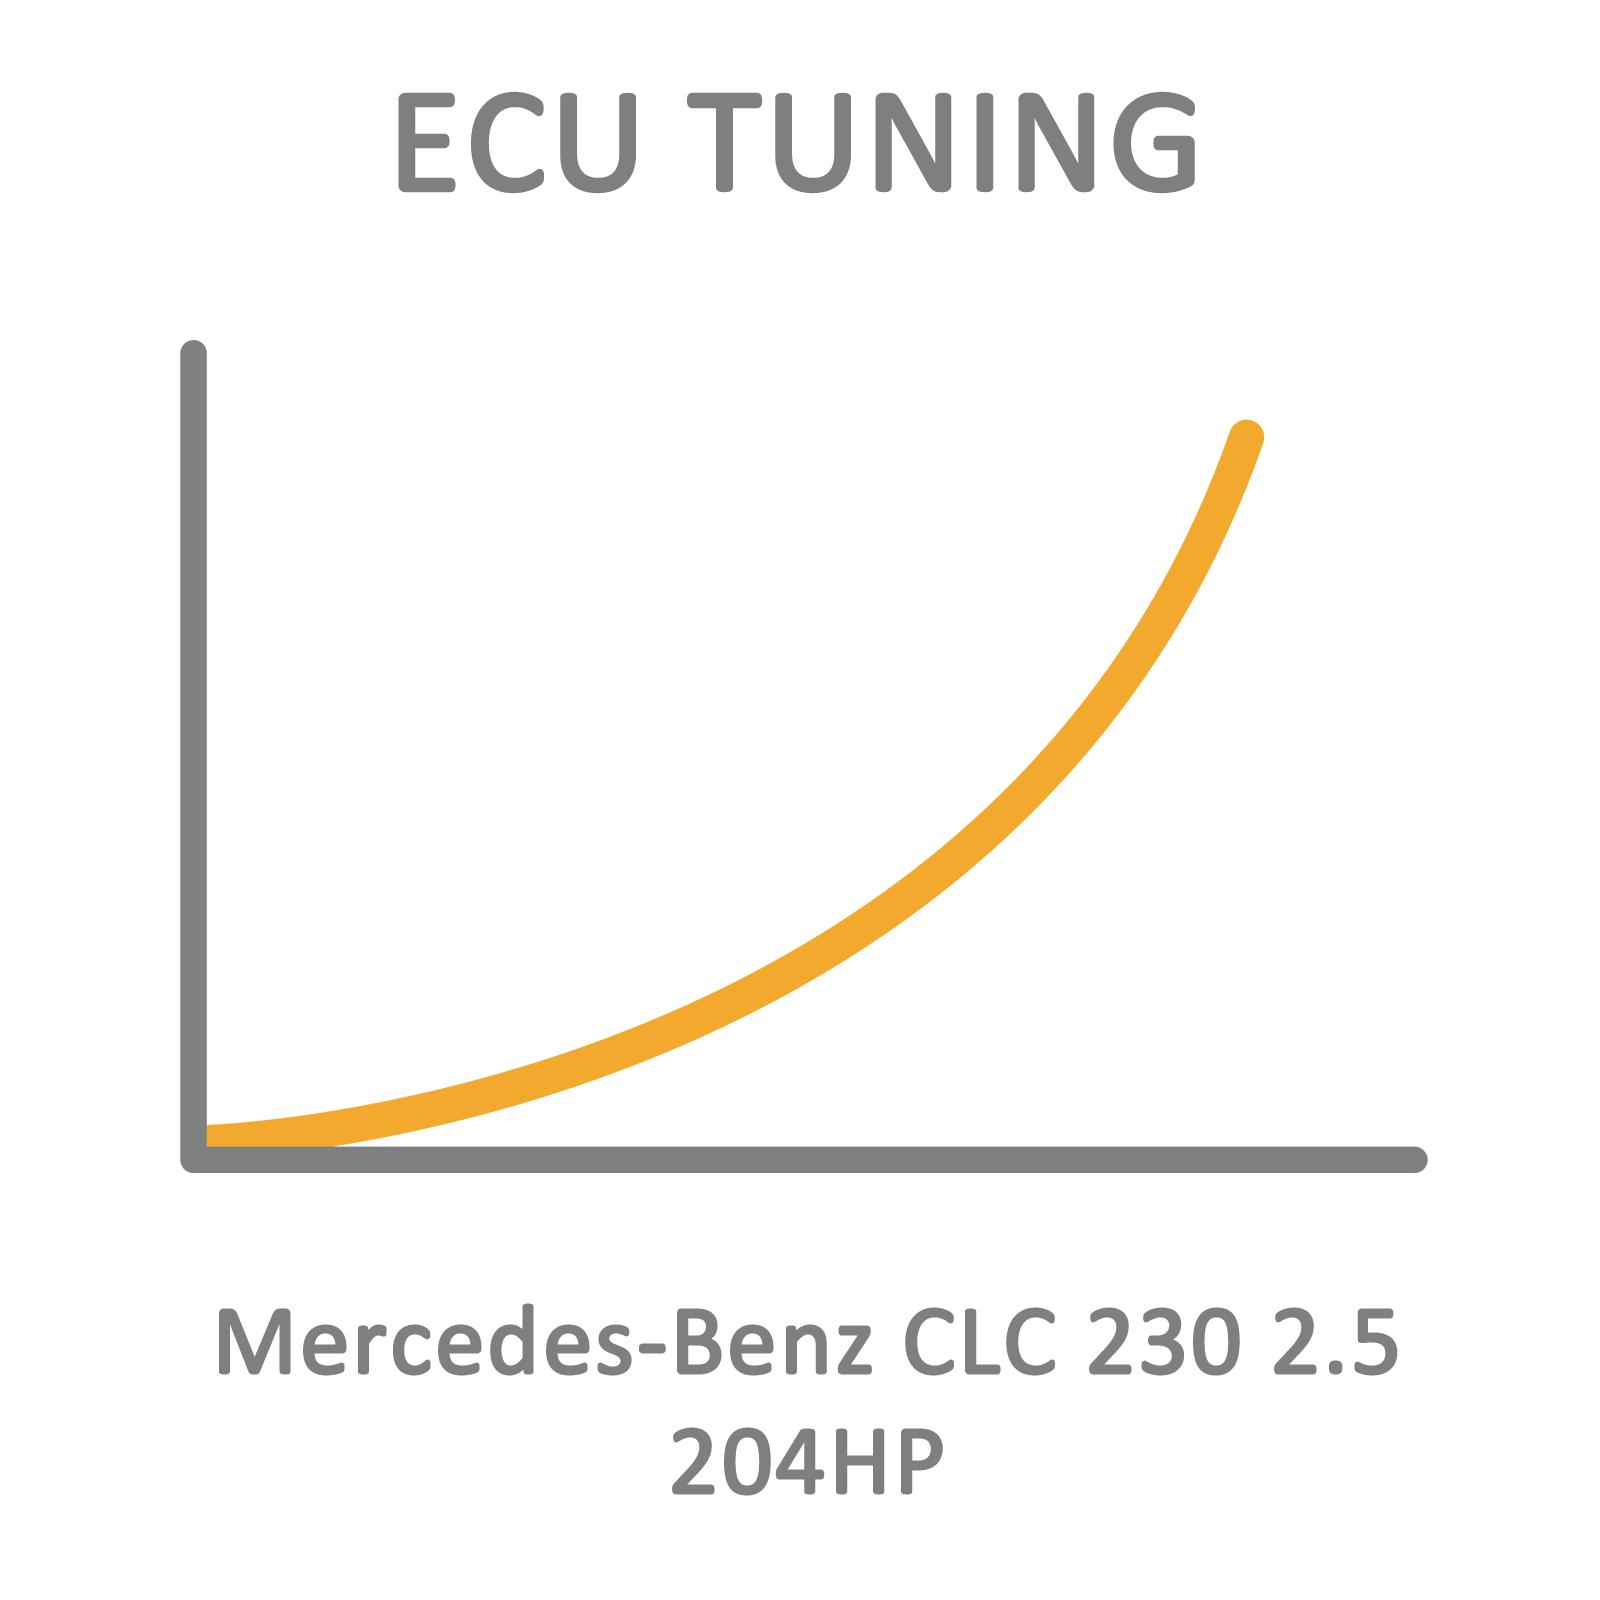 Mercedes-Benz CLC 230 2.5 204HP ECU Tuning Remapping